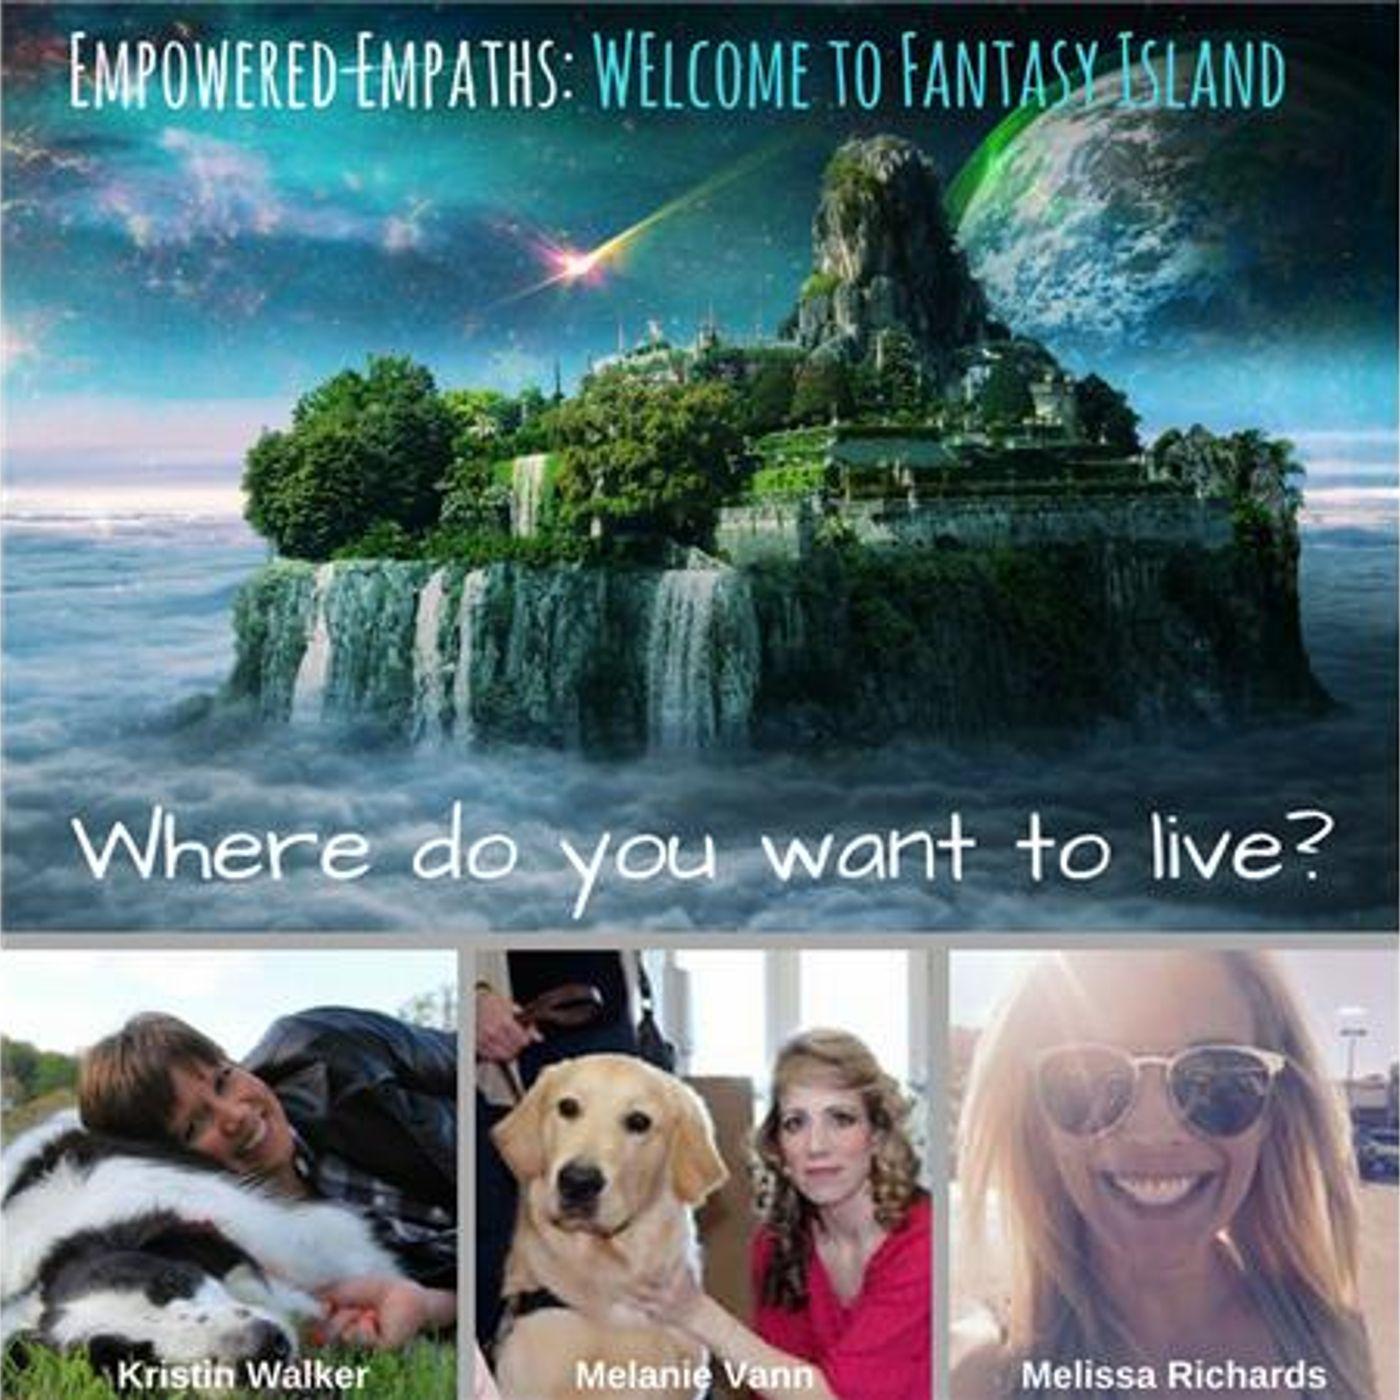 Mental Health News Radio - Empowered Empaths: Welcome to Fantasy Island